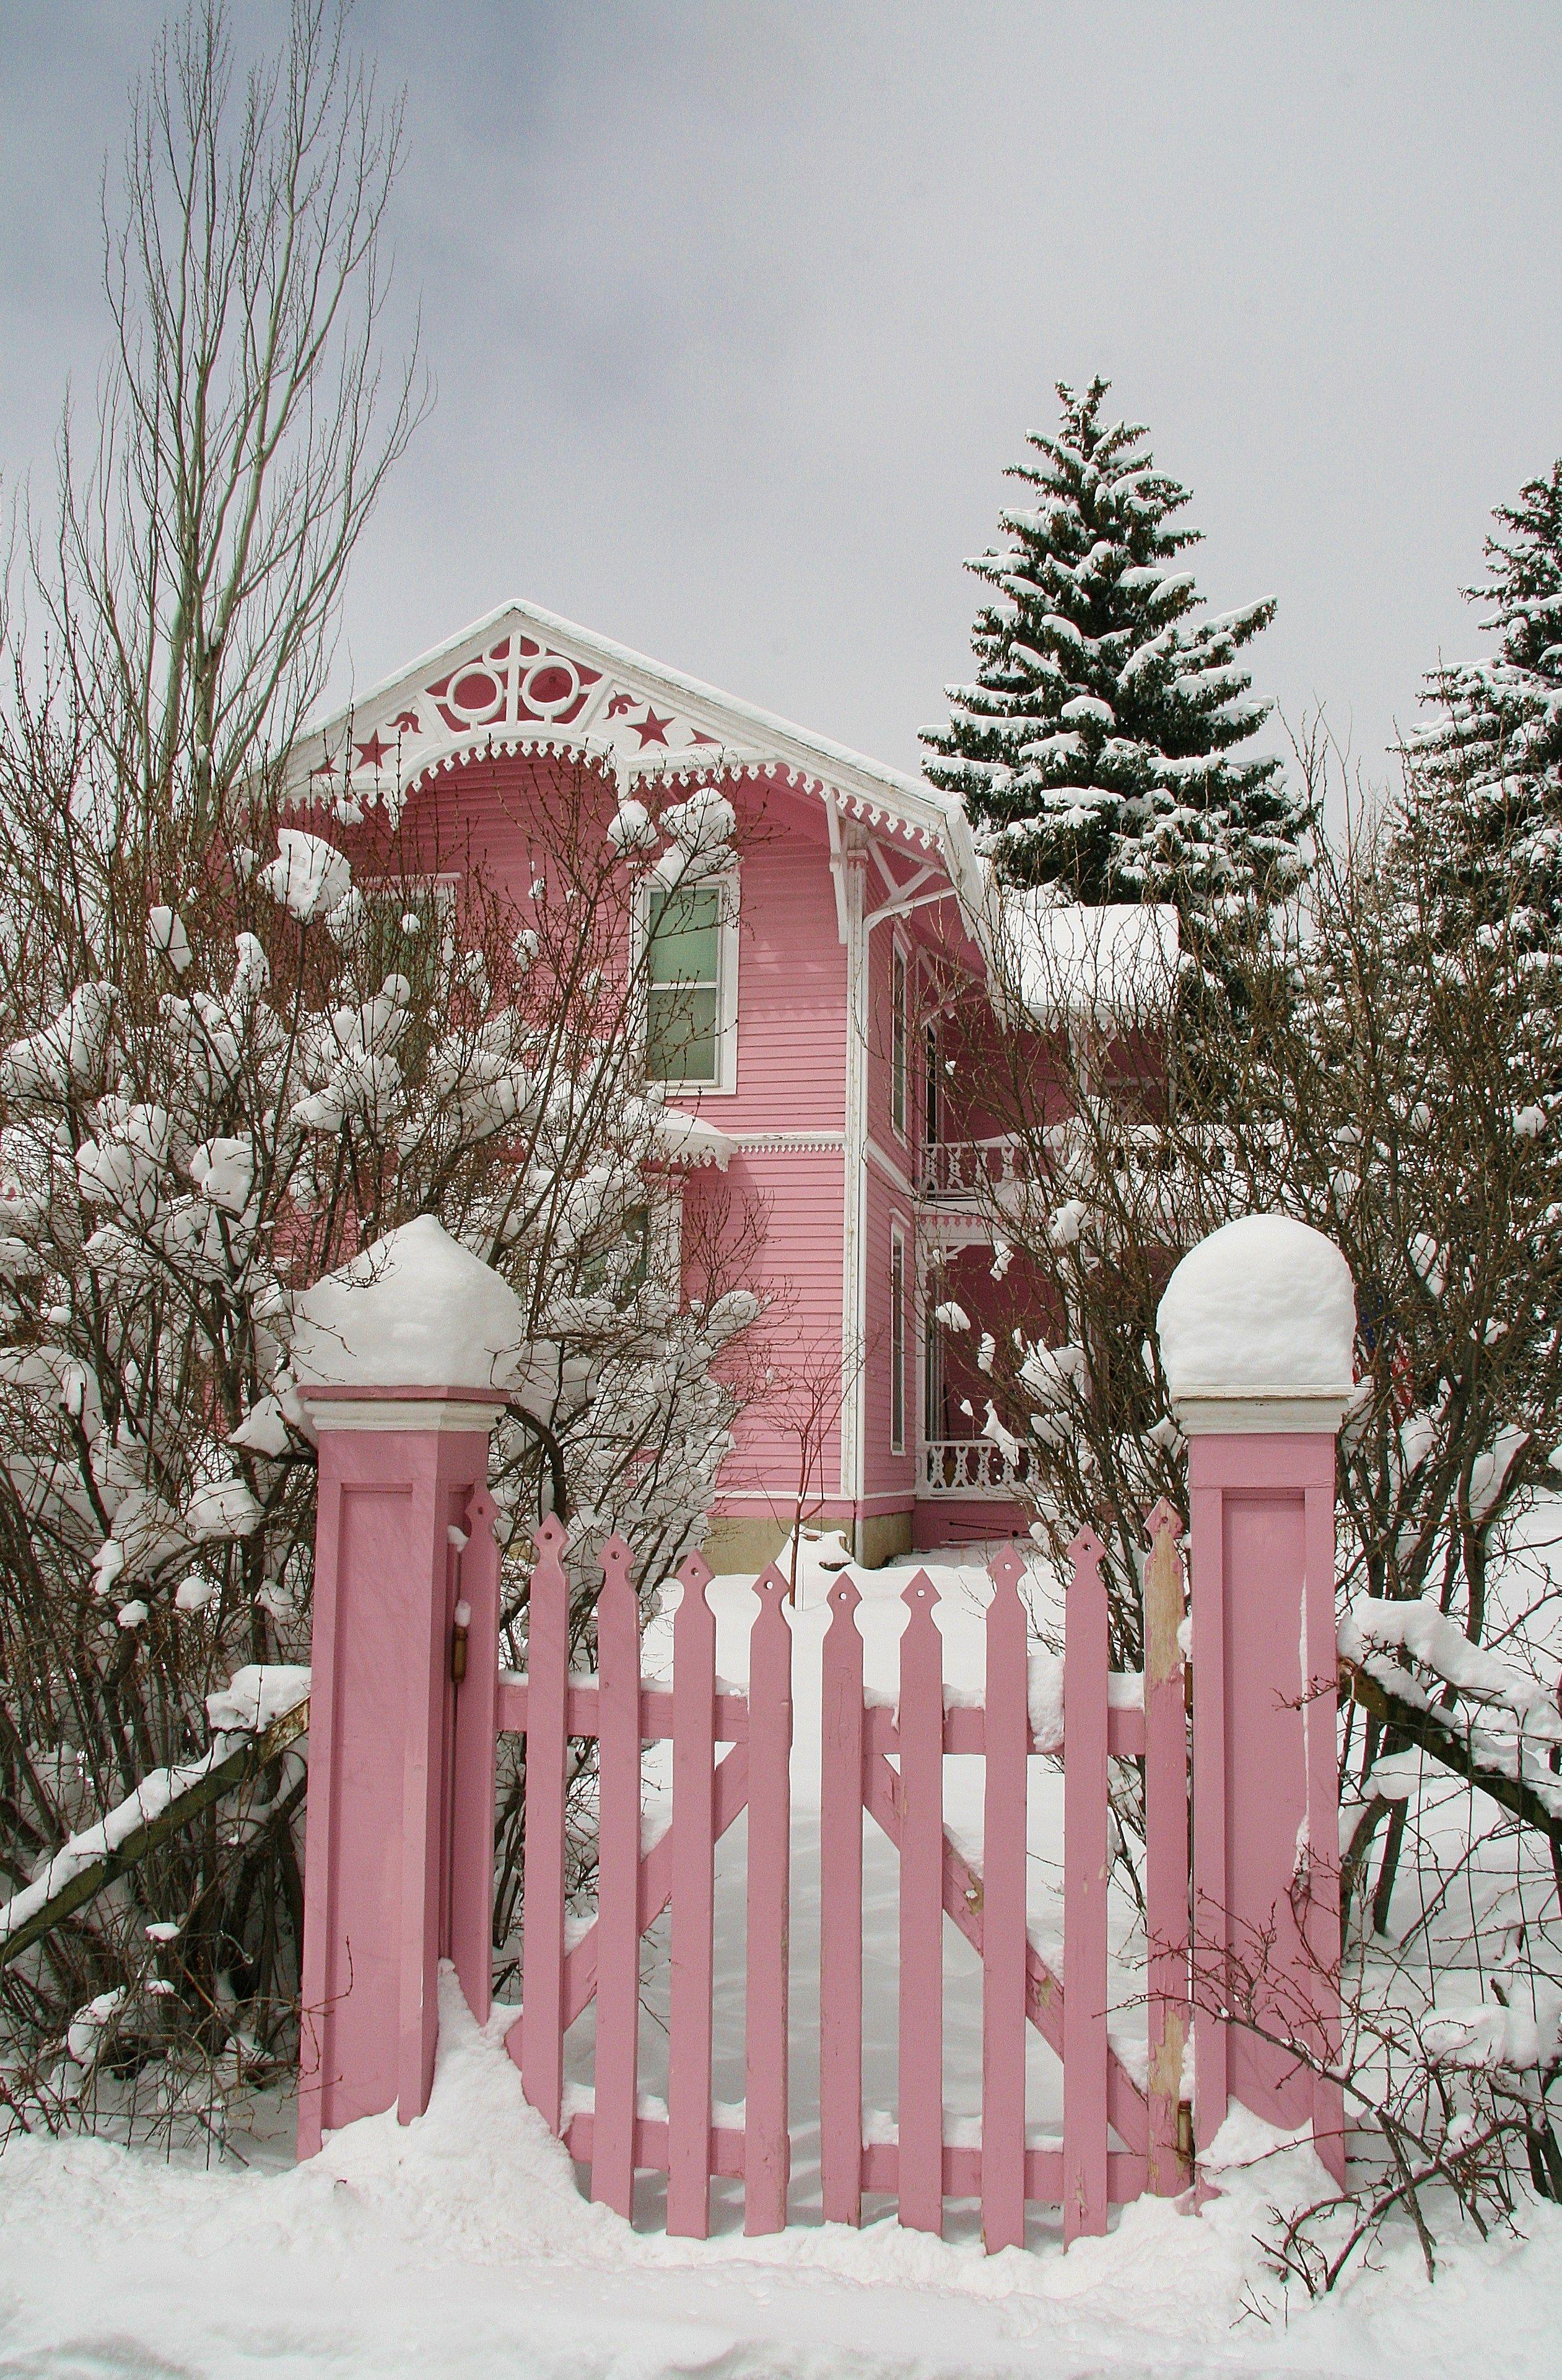 Pin by mackenzie childs on seek beauty everywhere pinterest rosa pink and pastell - Pastellfarben deko ...